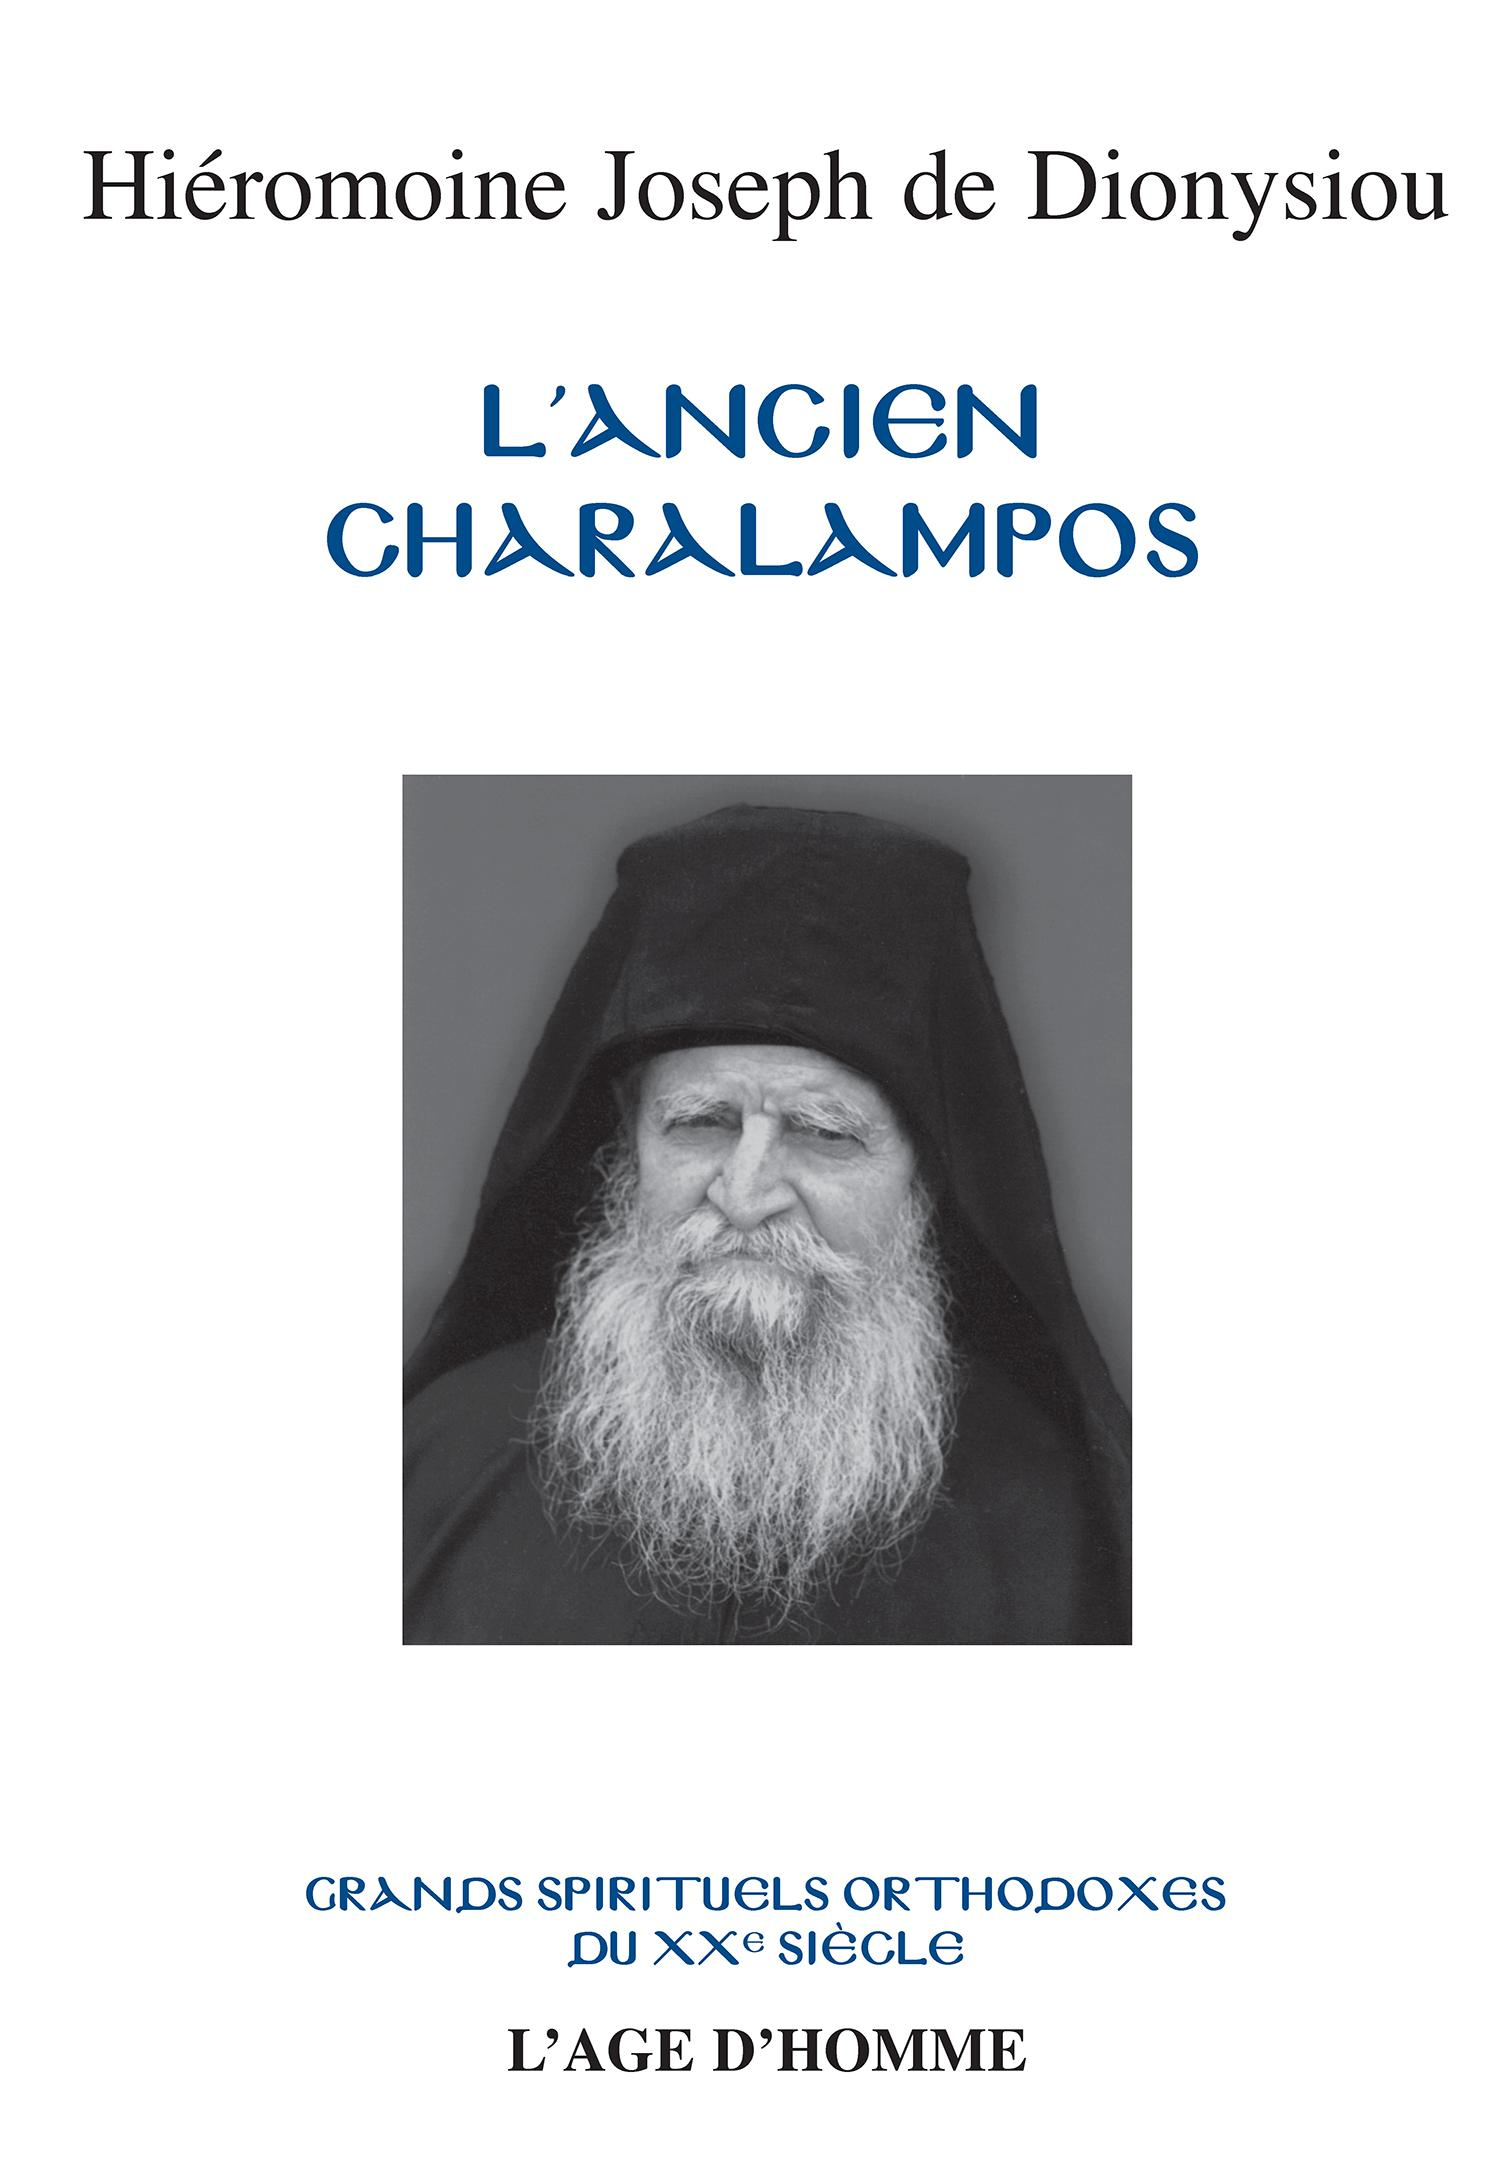 Joseph de Dionysiou - L'ancien Charalampos